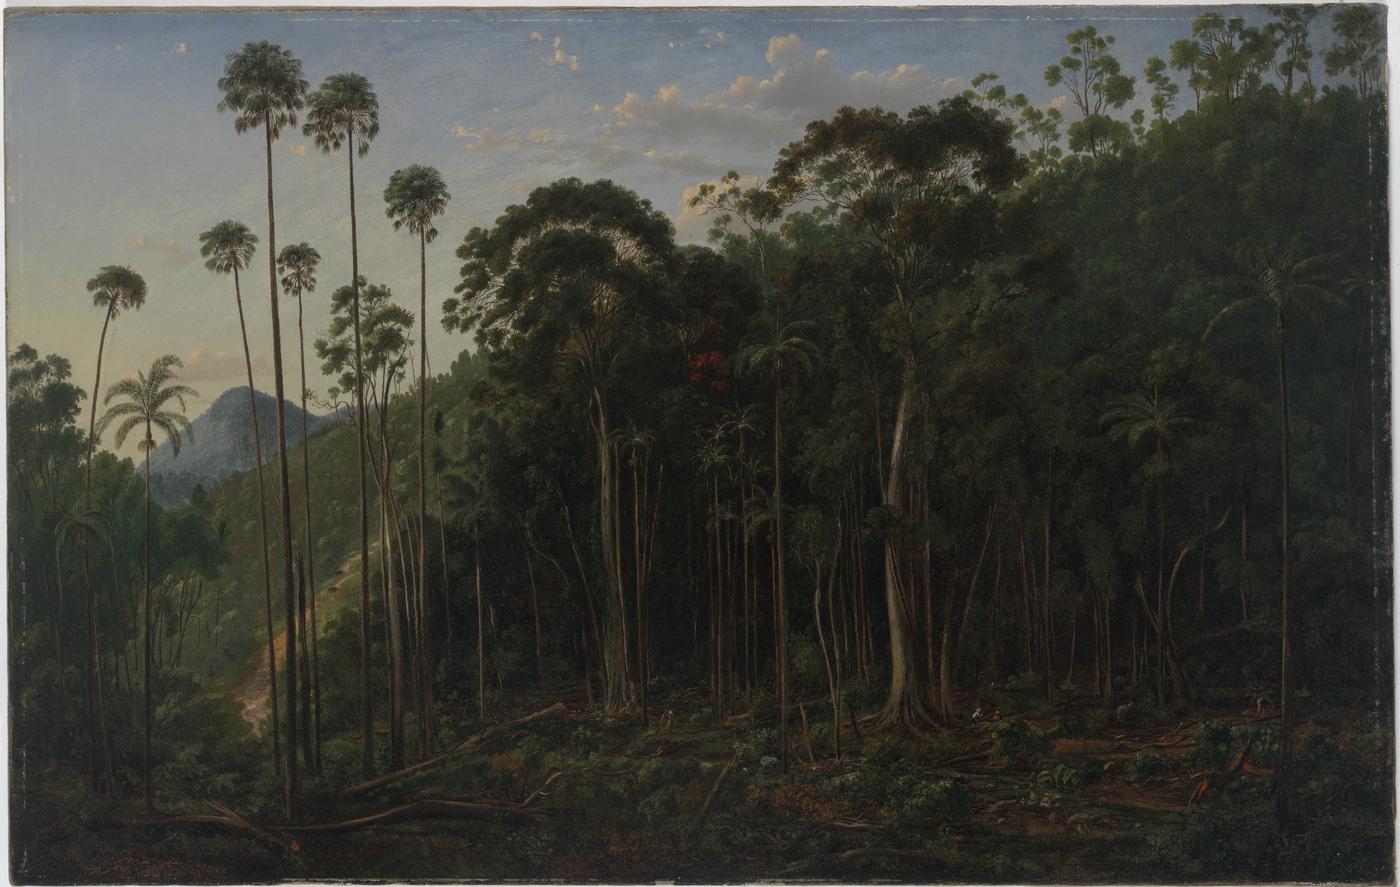 Cabbage Trees near the Shoalhaven River, N.S.W., 1860 / Eugene von Guerard